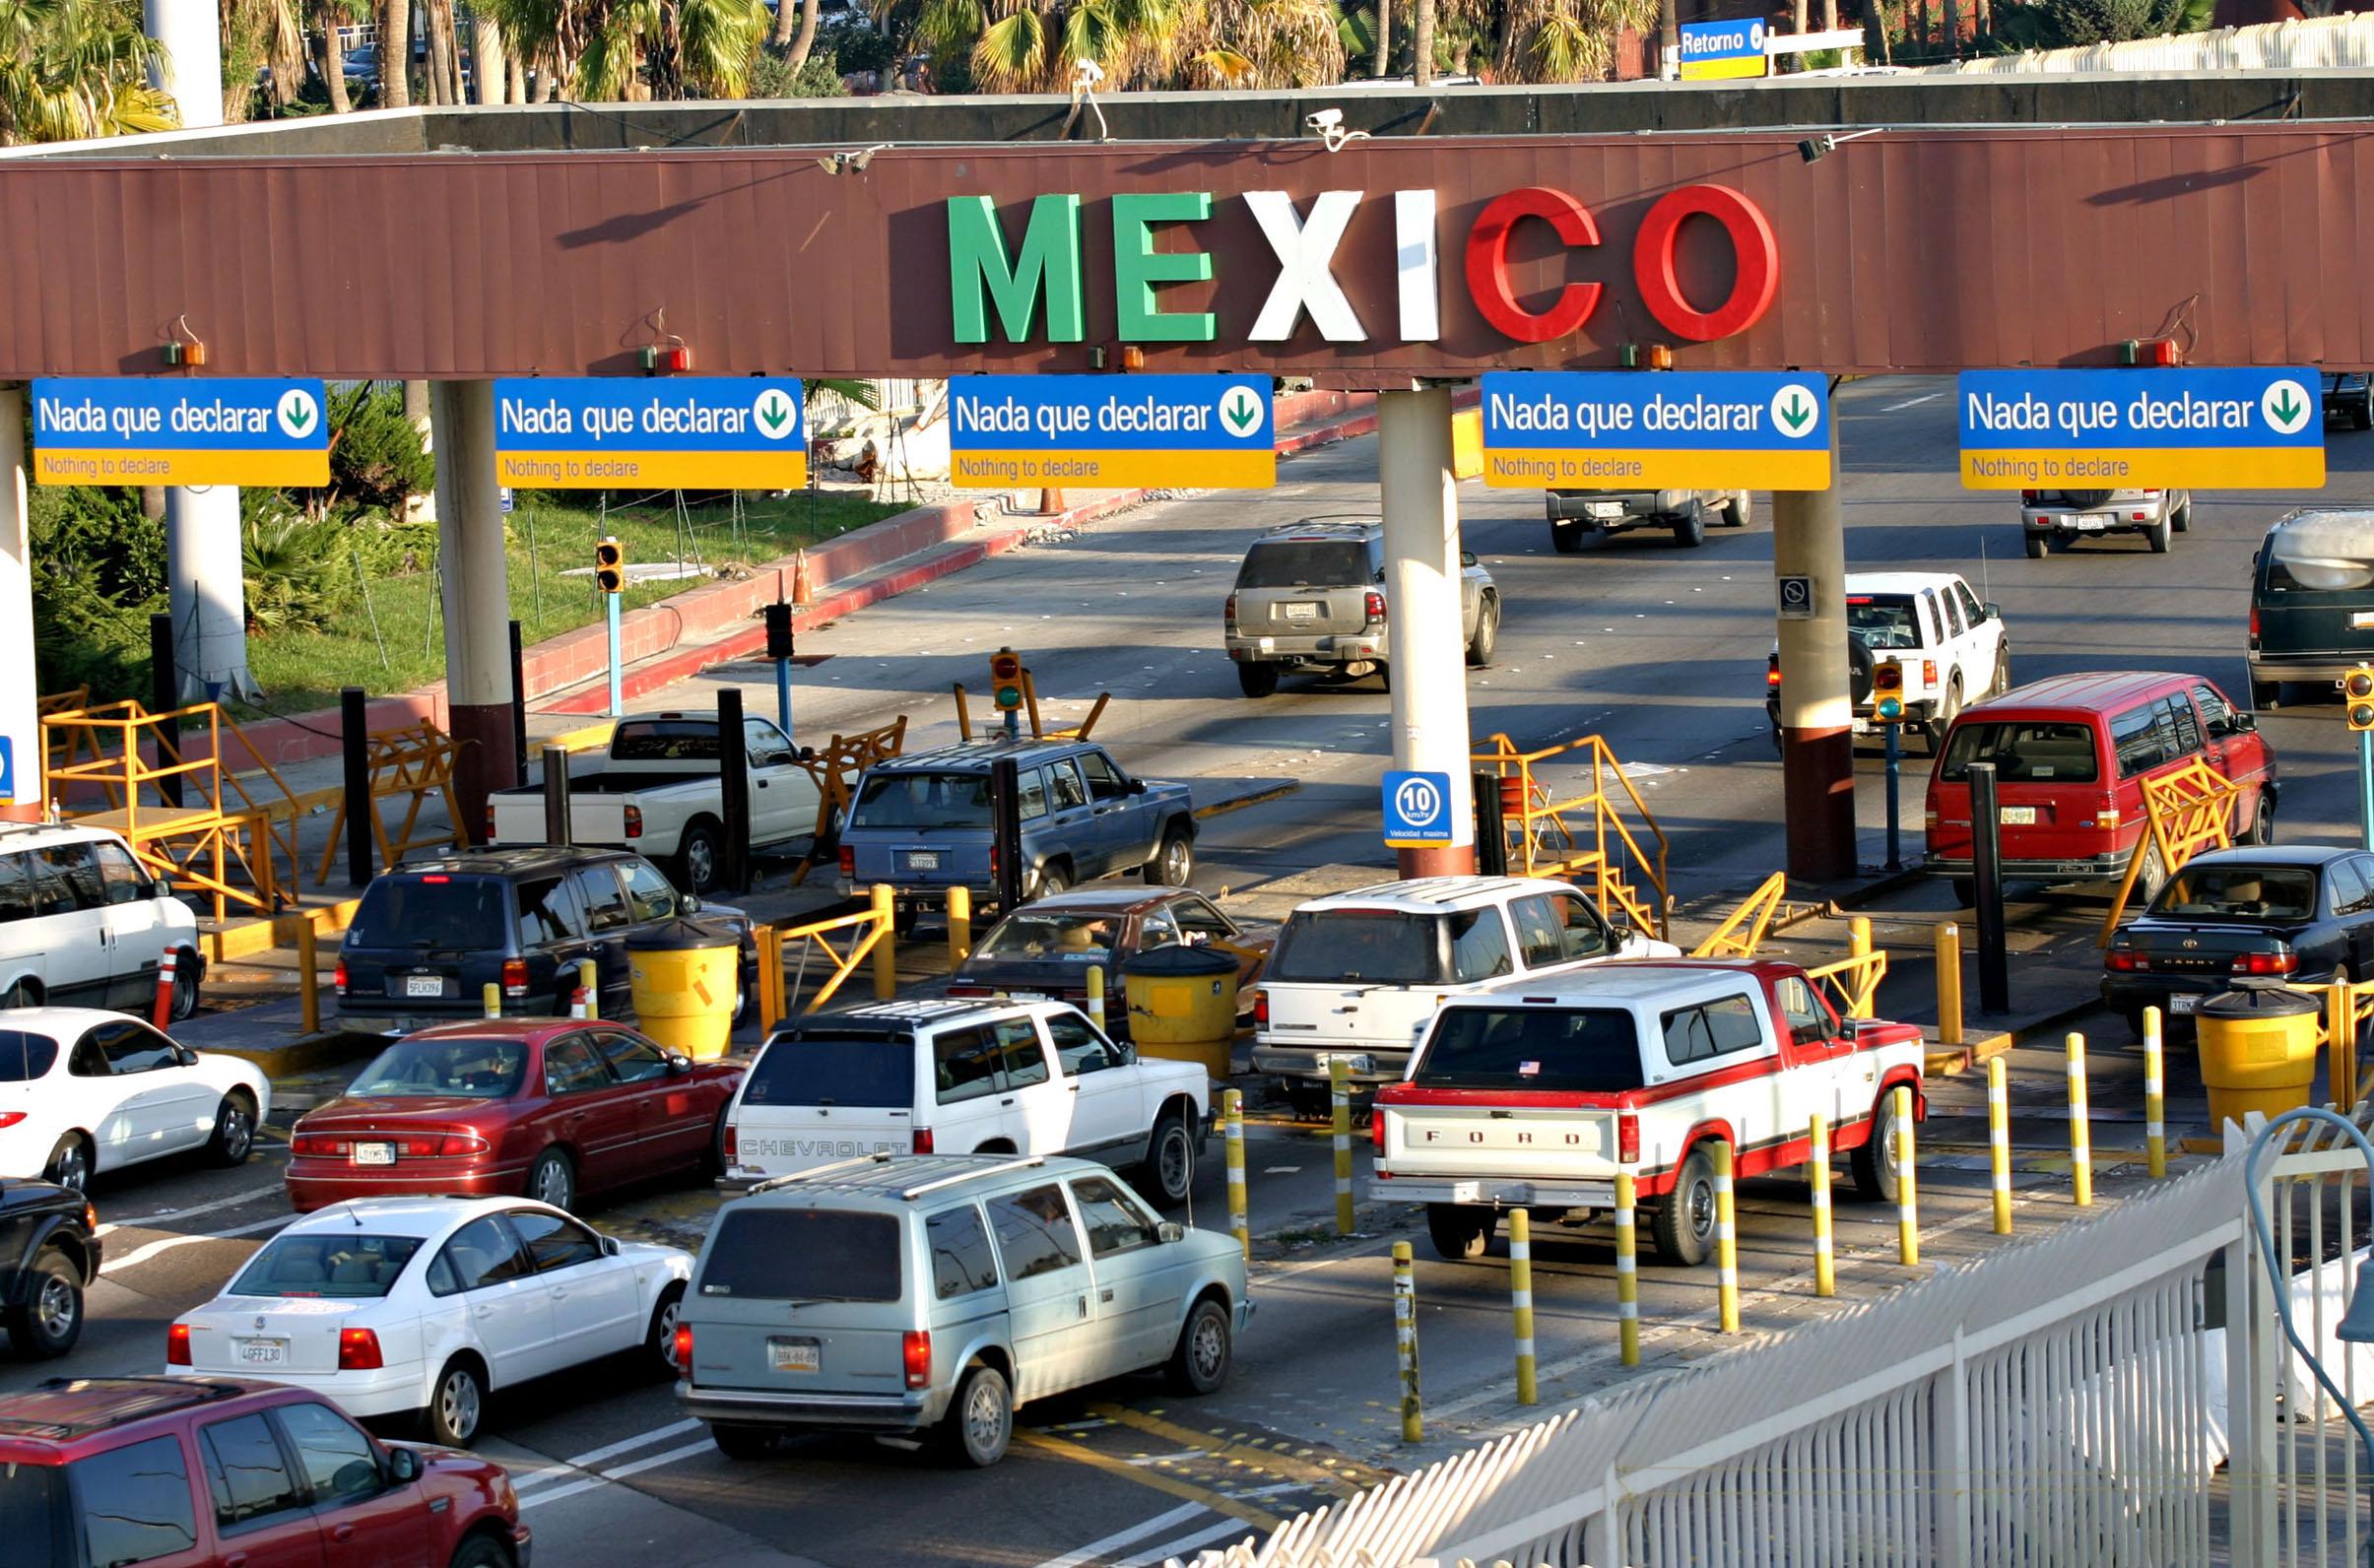 Mexico-USA, Tribune News Service